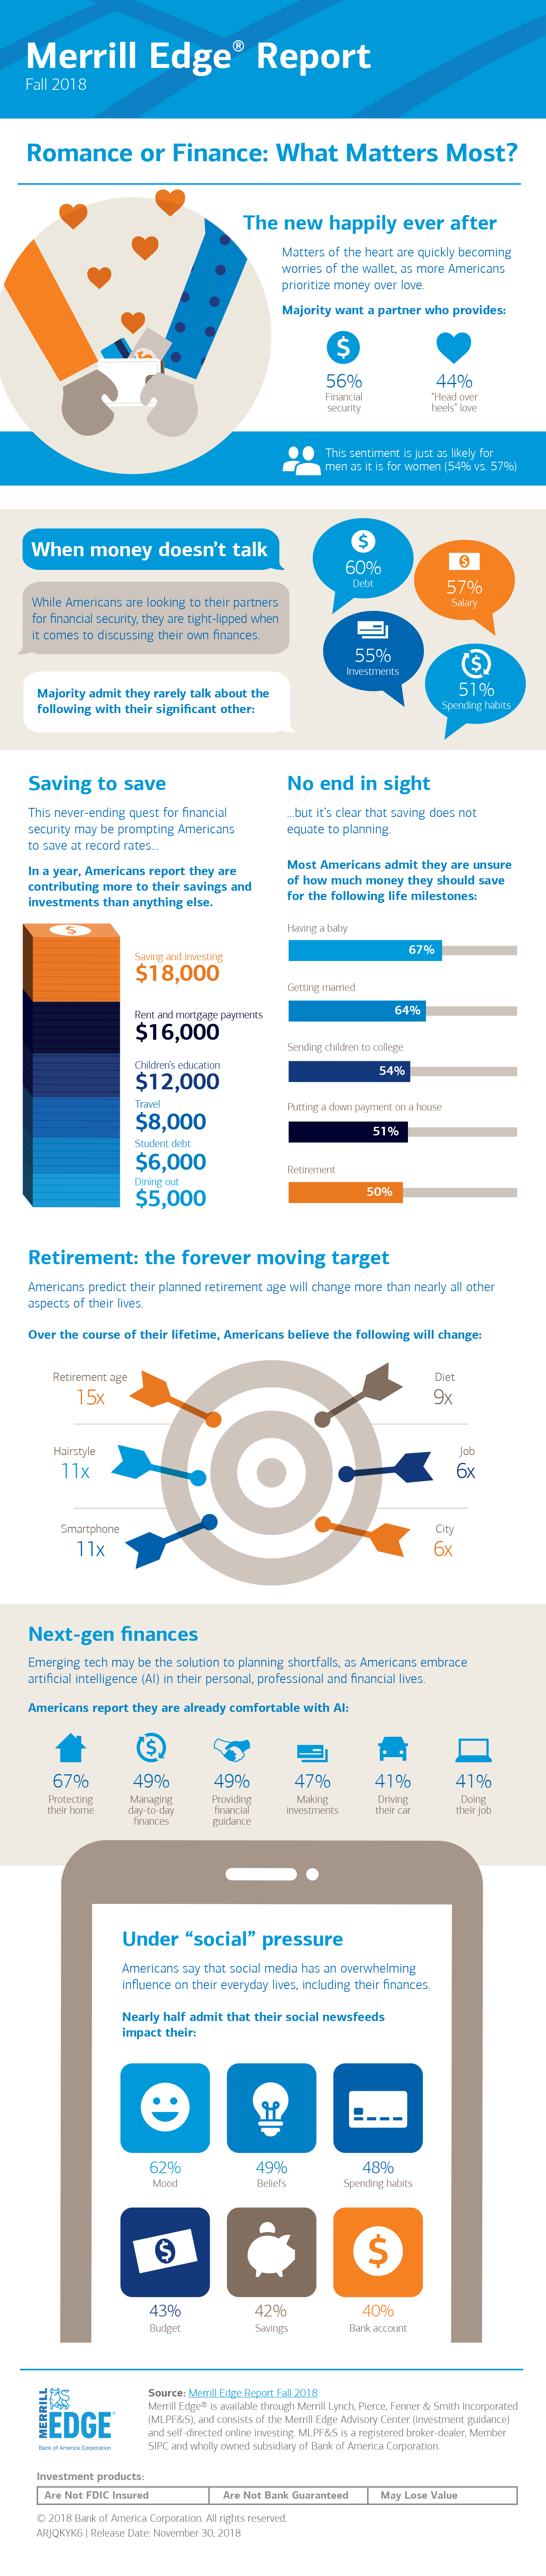 Merrill Edge Report: Fall 2018 infographic